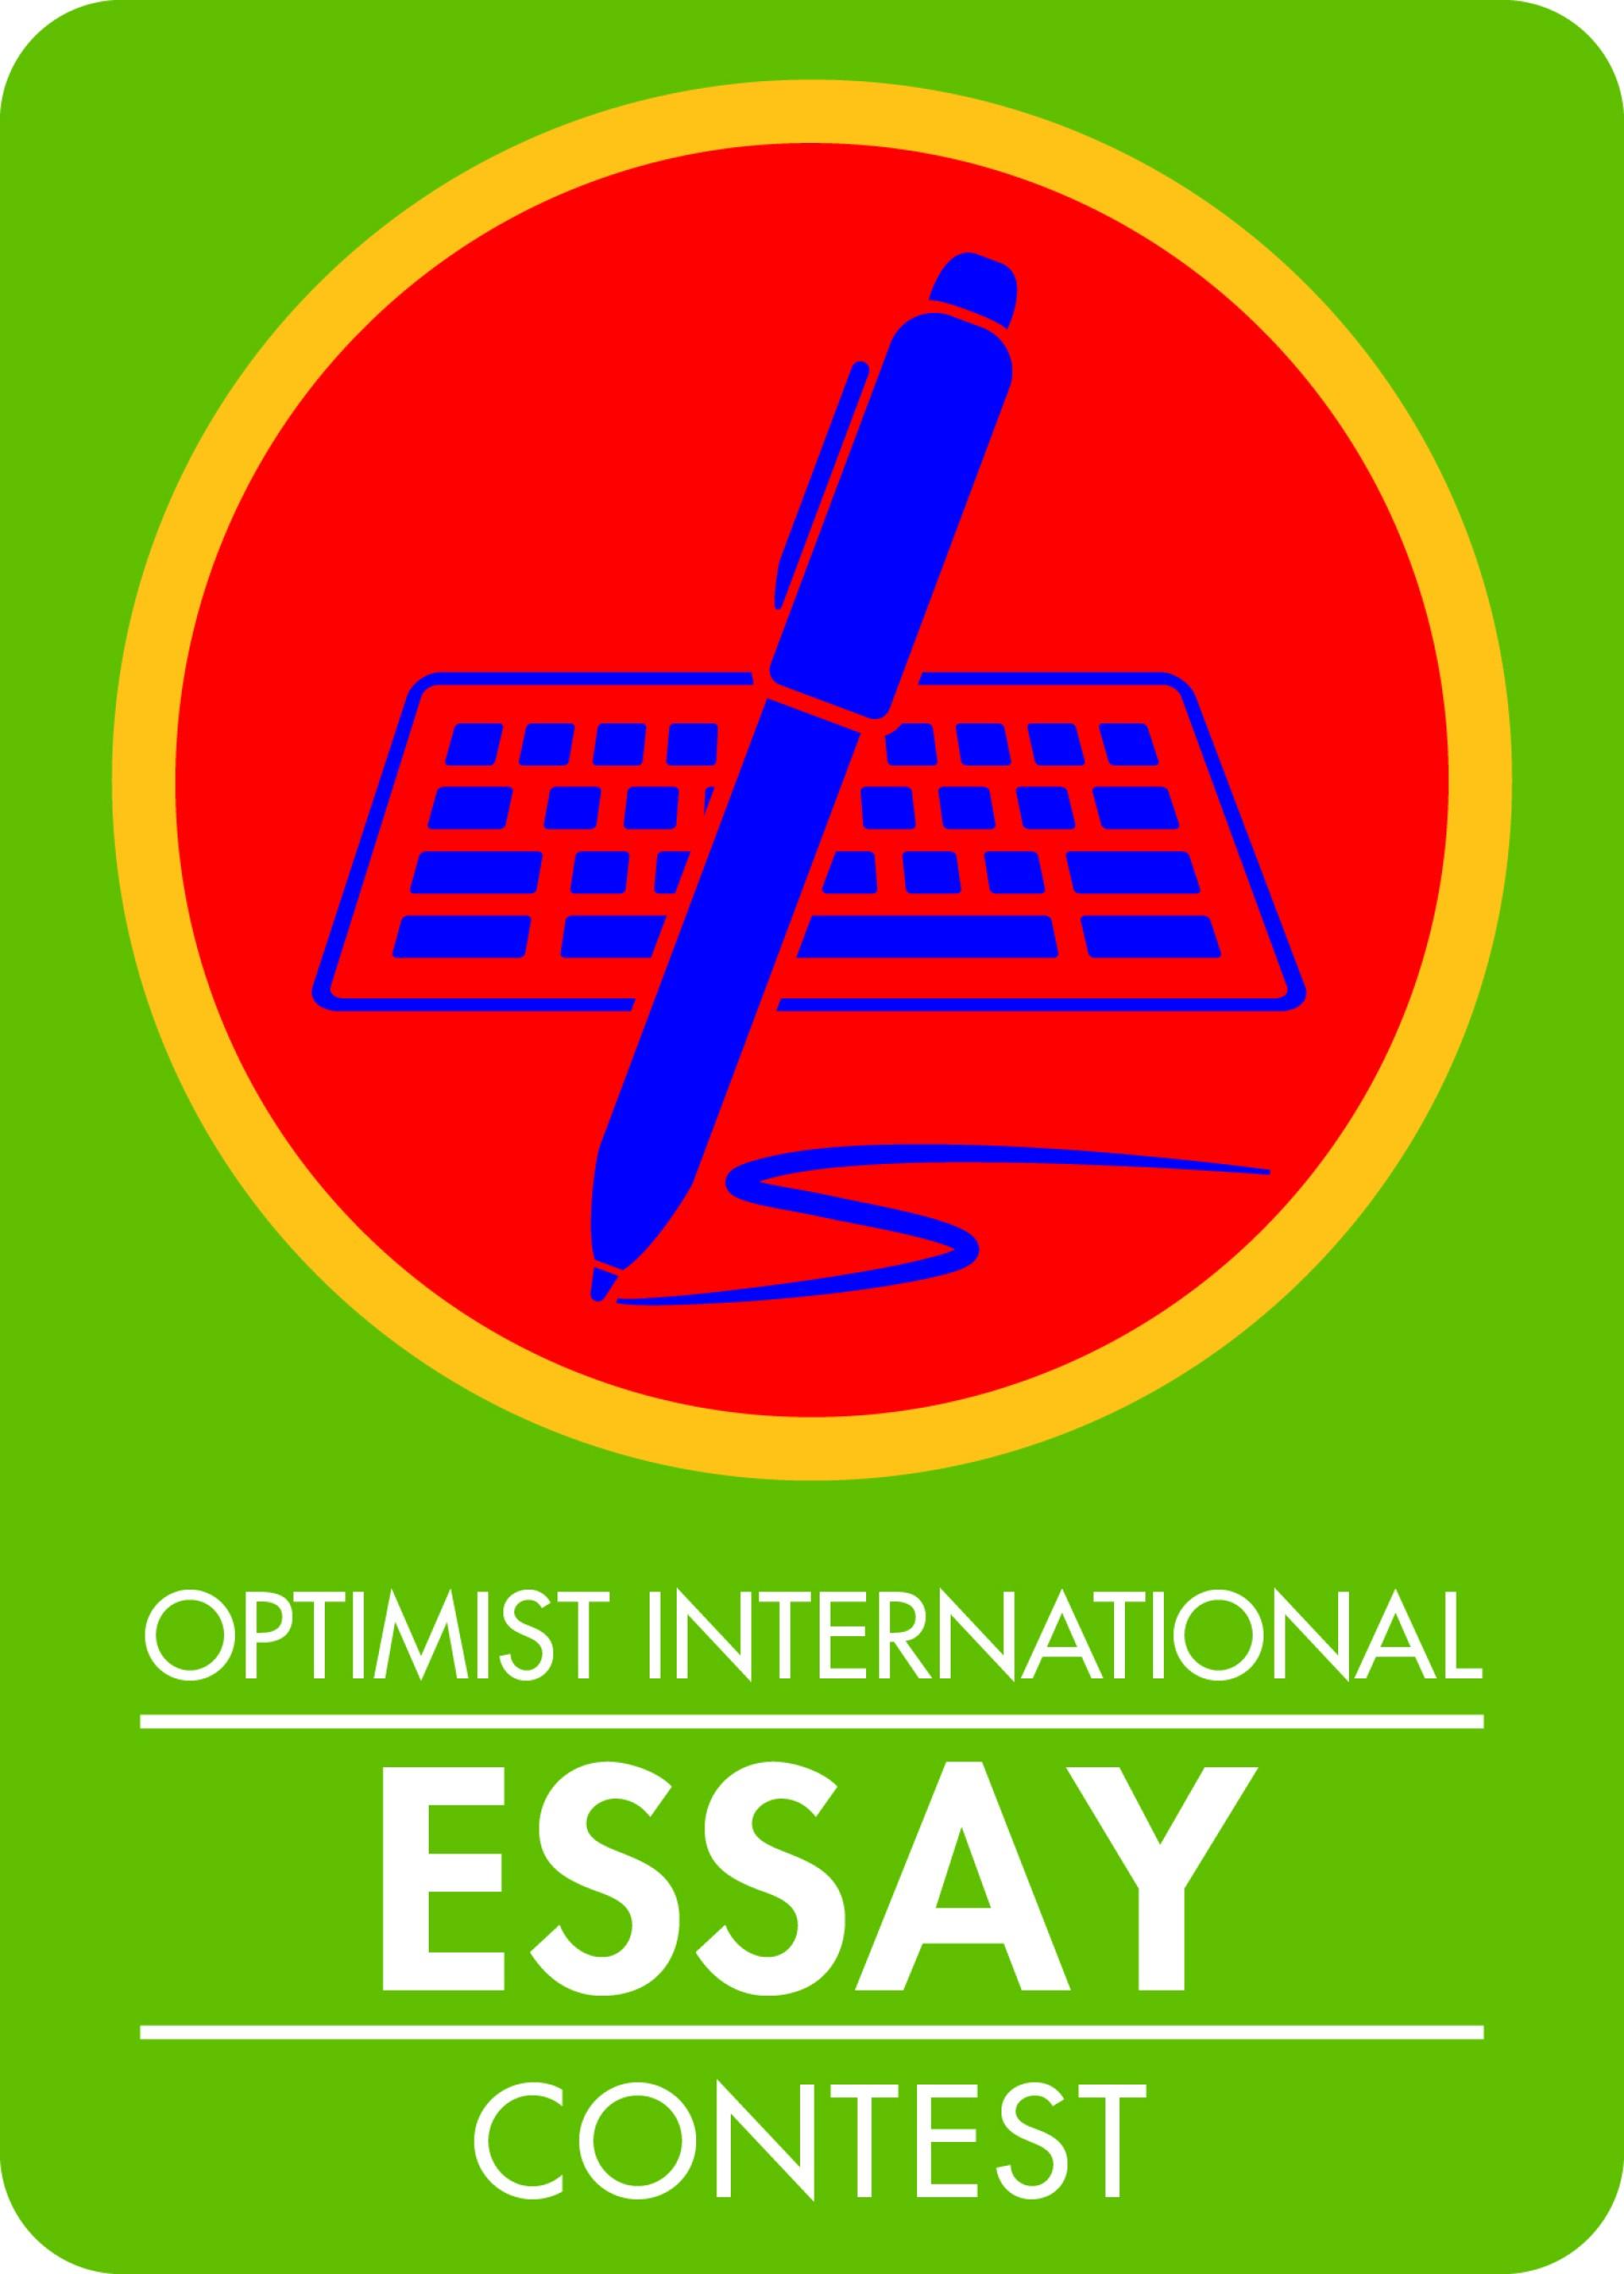 001 Essay Example High Res Optimist International Wondrous Contest Winners Due Date Oratorical 1920